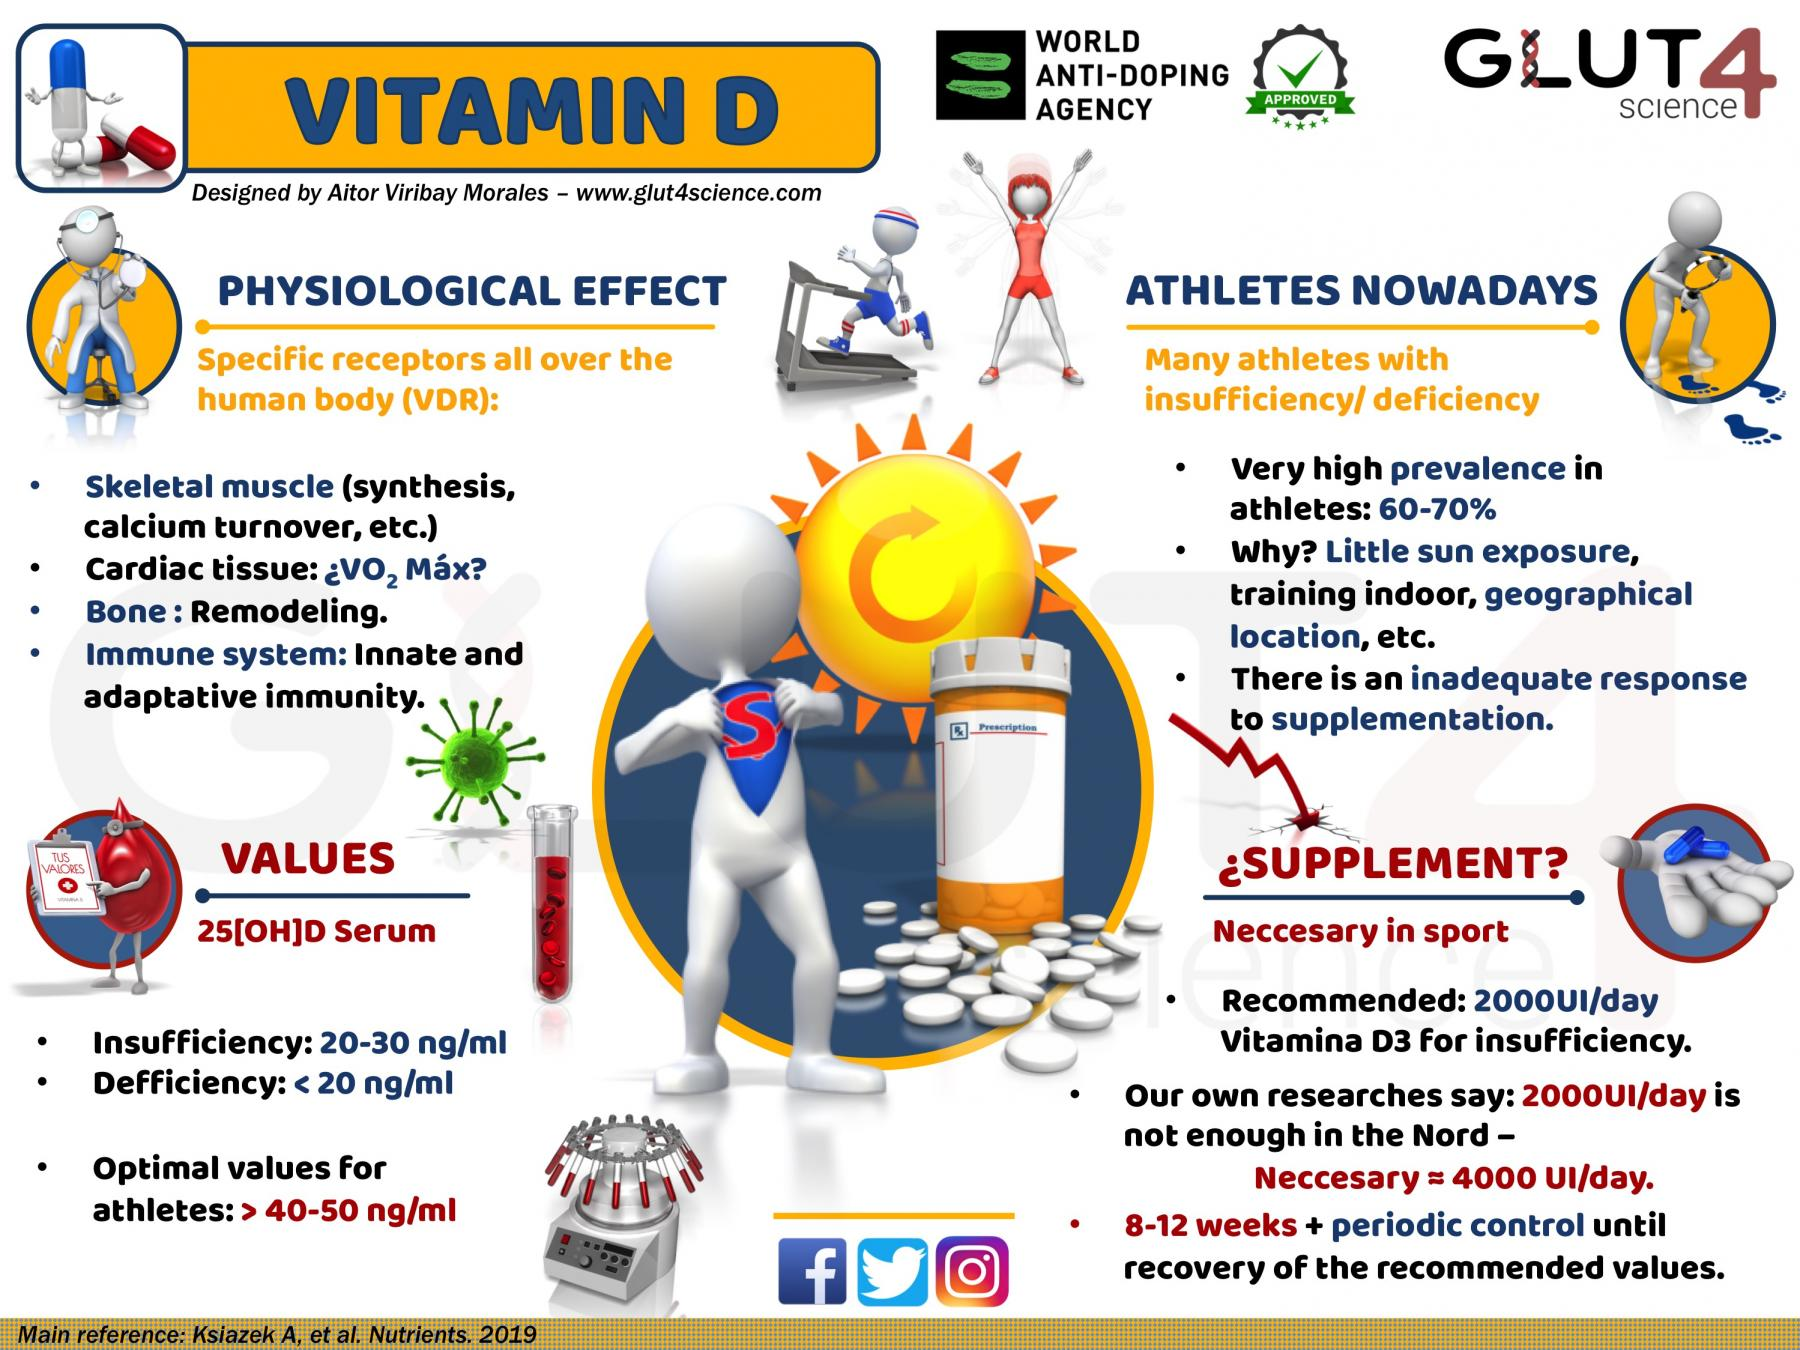 Vitamin D Supplementation in Athletes